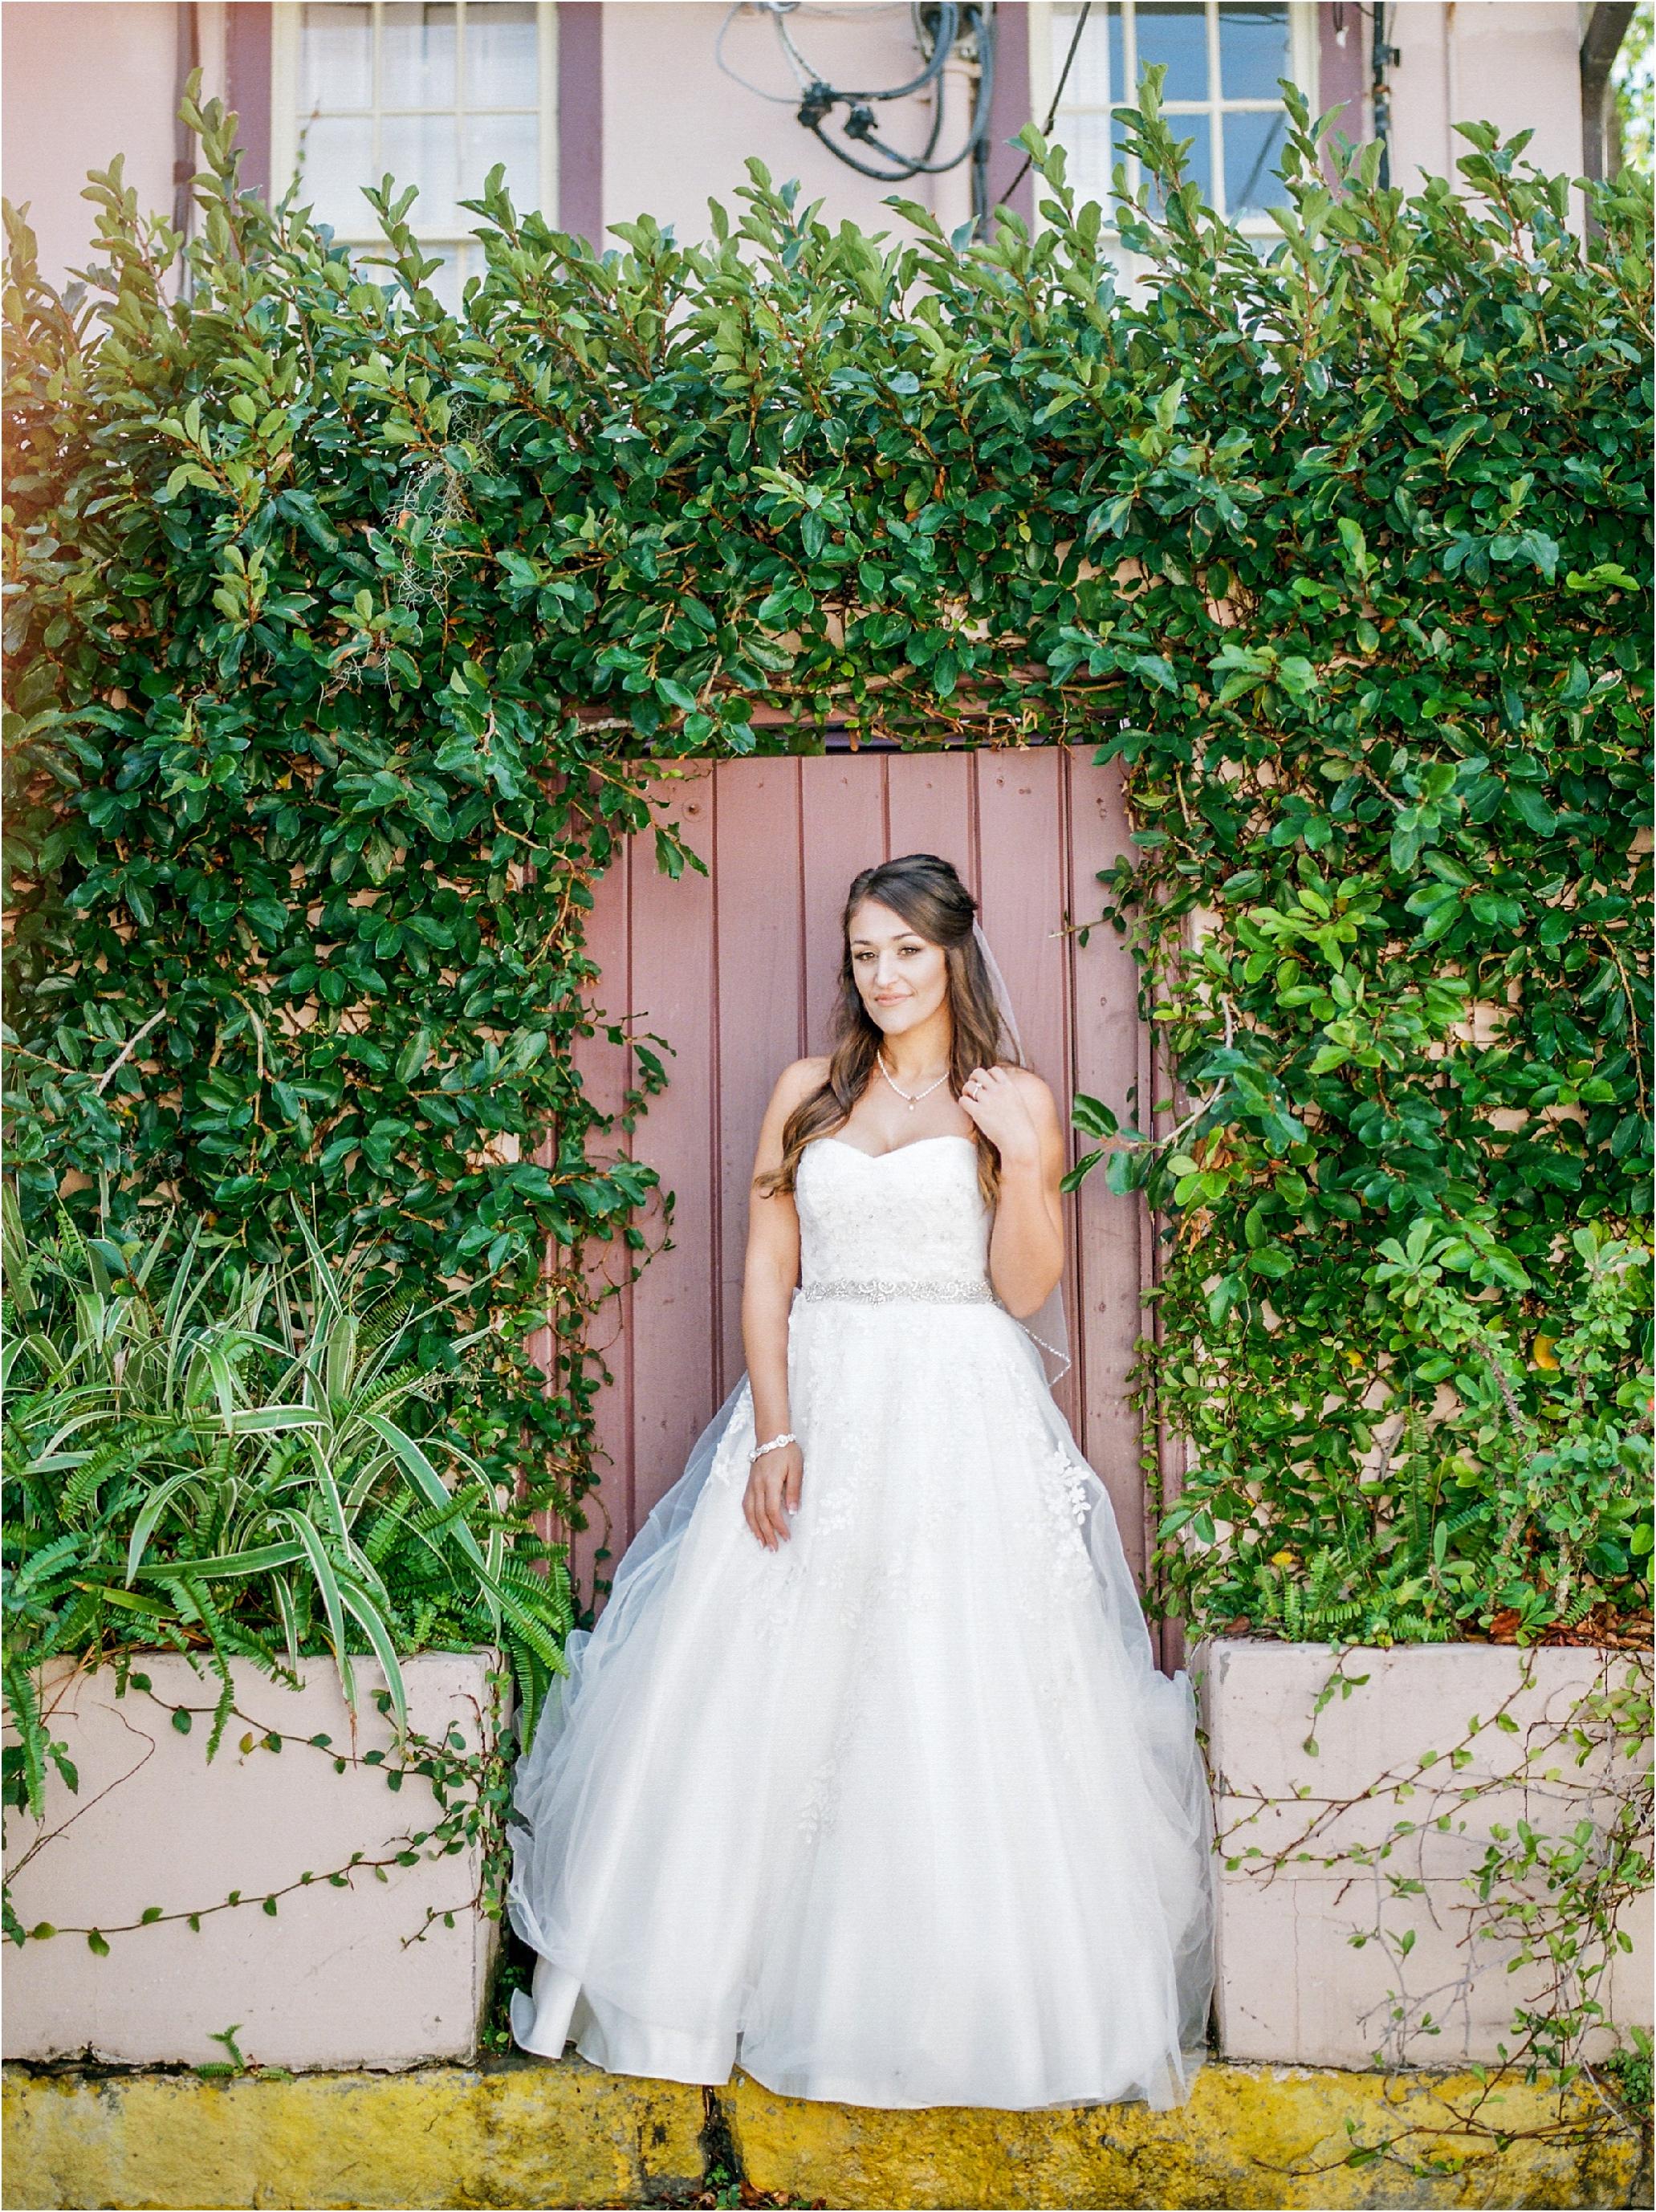 Lisa Silva Photography- Ponte Vedra Beach and Jacksonville, Florida Fine Art Film Wedding Photography- Wedding at The White Room Villa Blanca in St. Augustine, Florida_0013.jpg